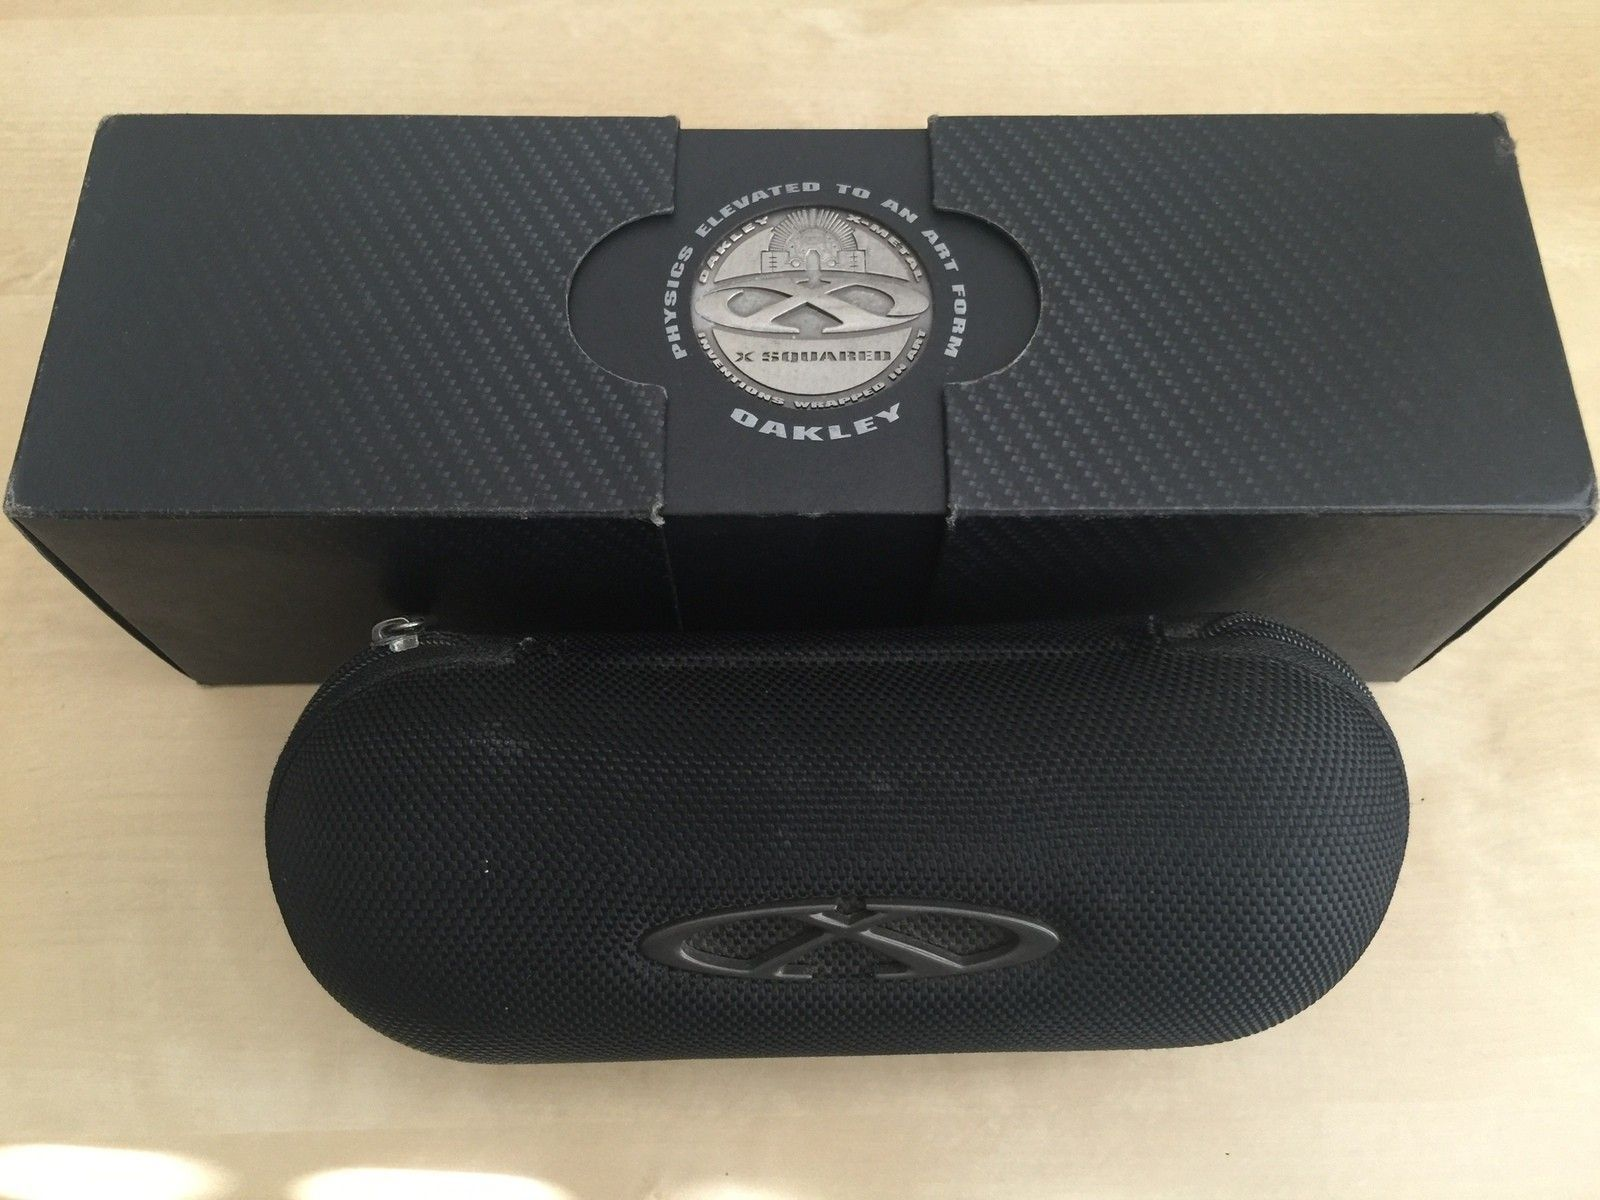 XS Polished with Chrome Polars (mint) with bonus OEM Slate lenses - $550 Shipped - IMG_4927.JPG